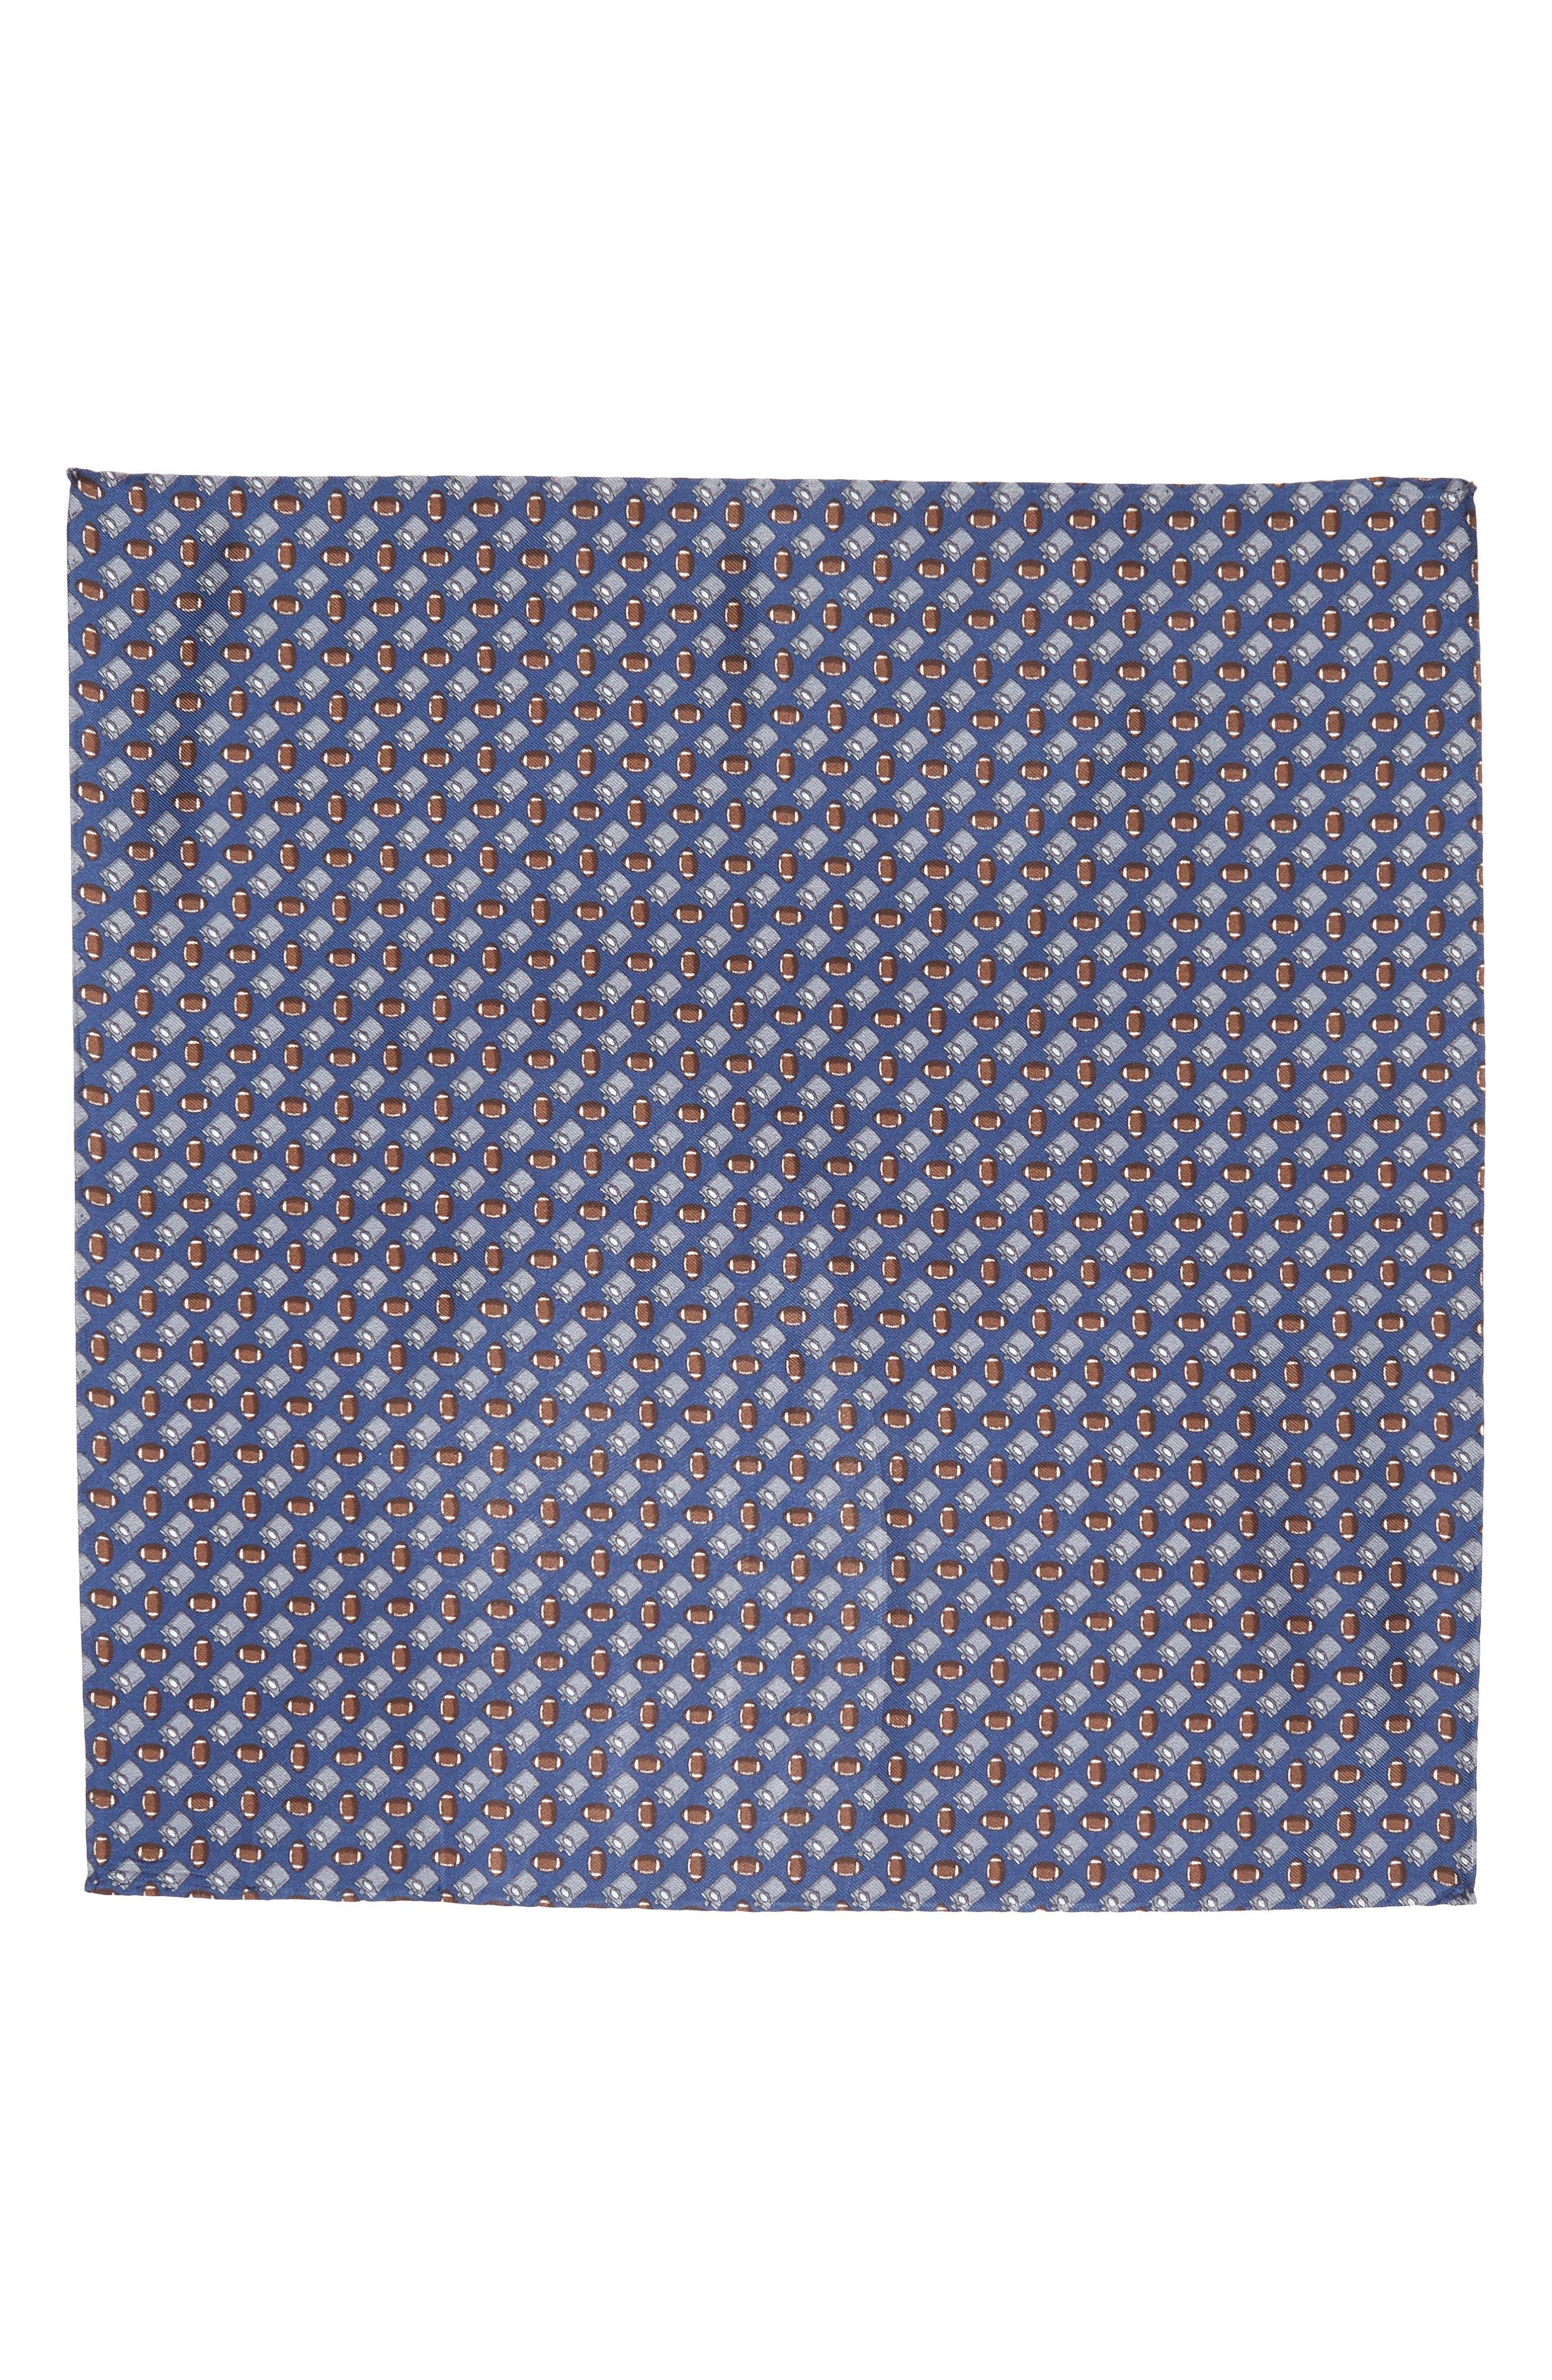 LAZYJACK PRESS,                             Tailgating Silk Pocket Square,                             Alternate thumbnail 2, color,                             410